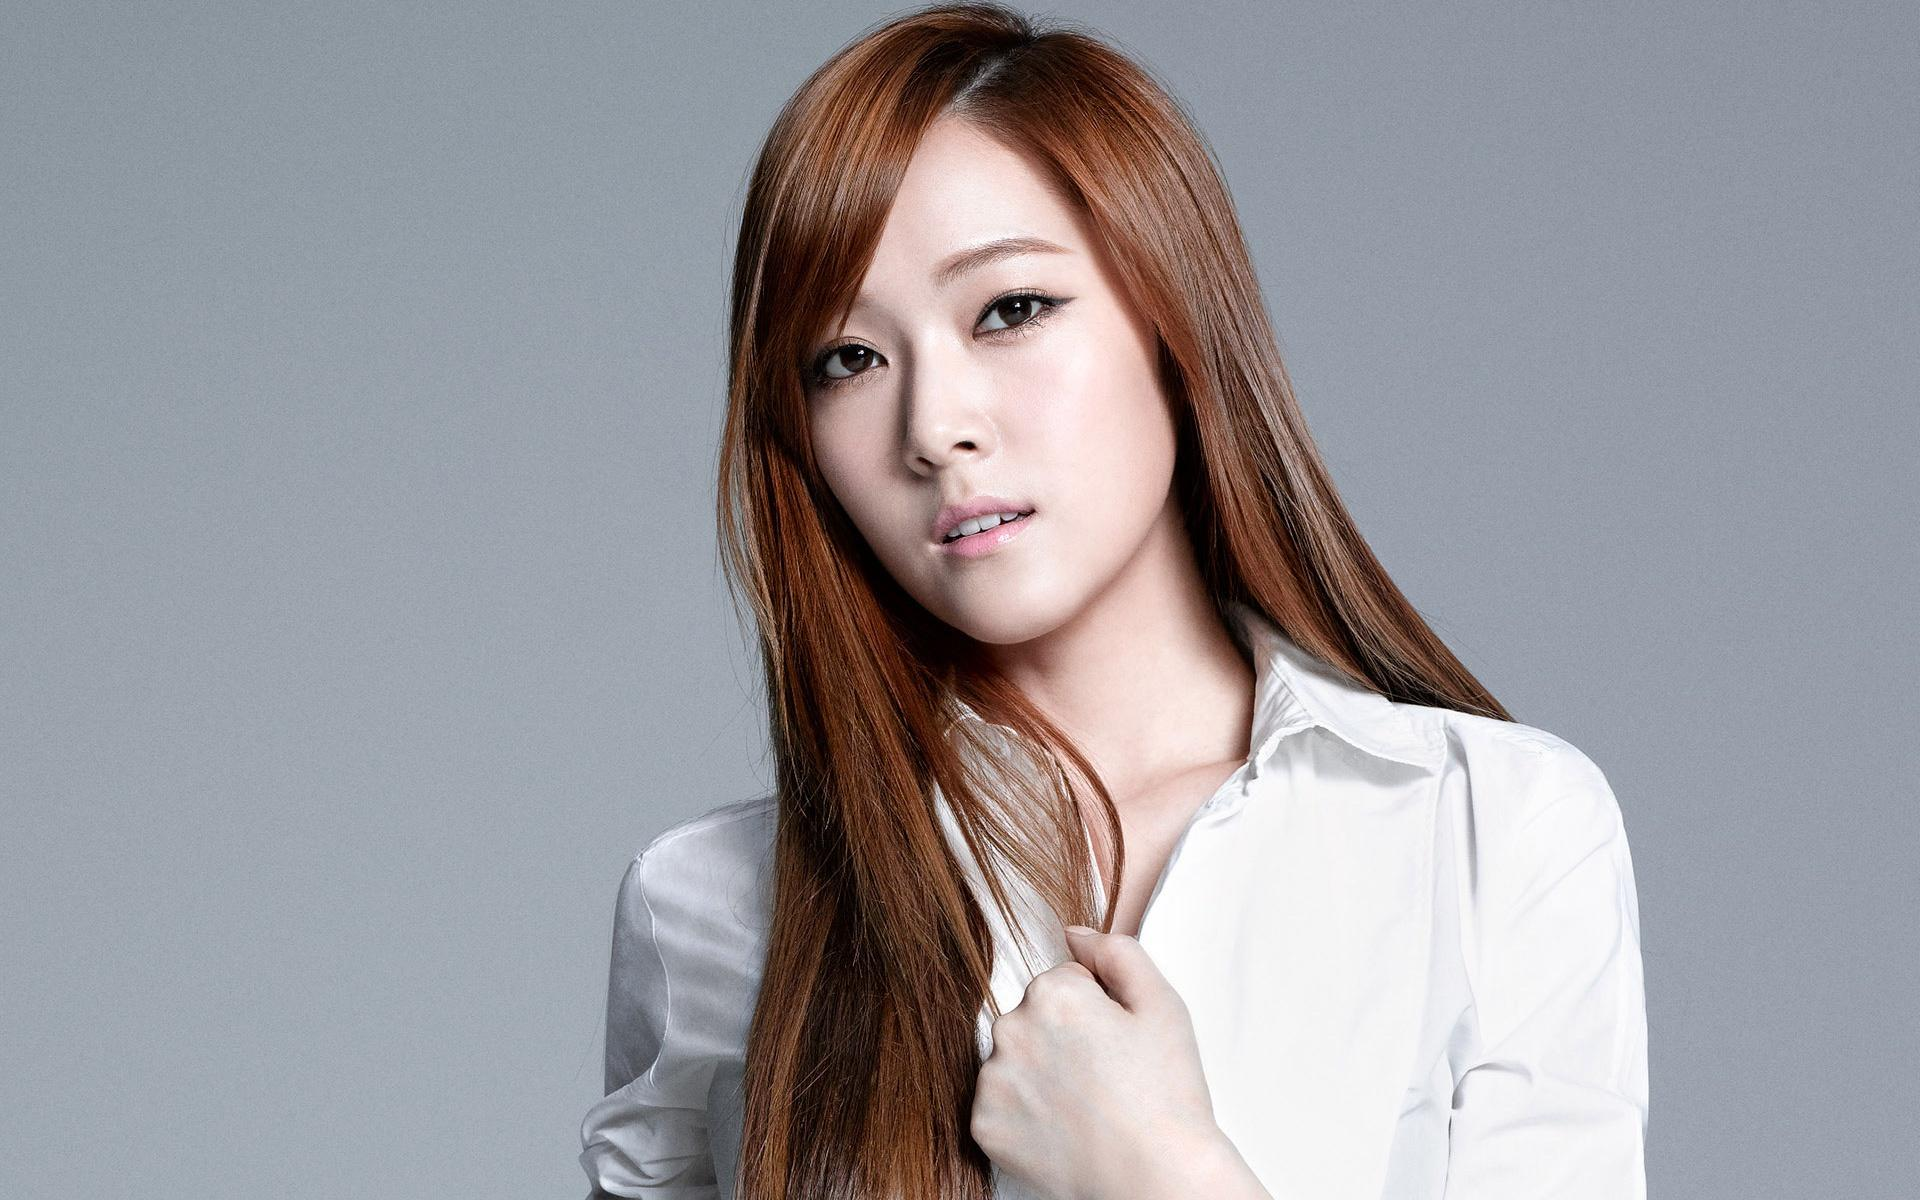 jessica_tach_nhom_hoat_dong_rieng_doisongphapluat_1